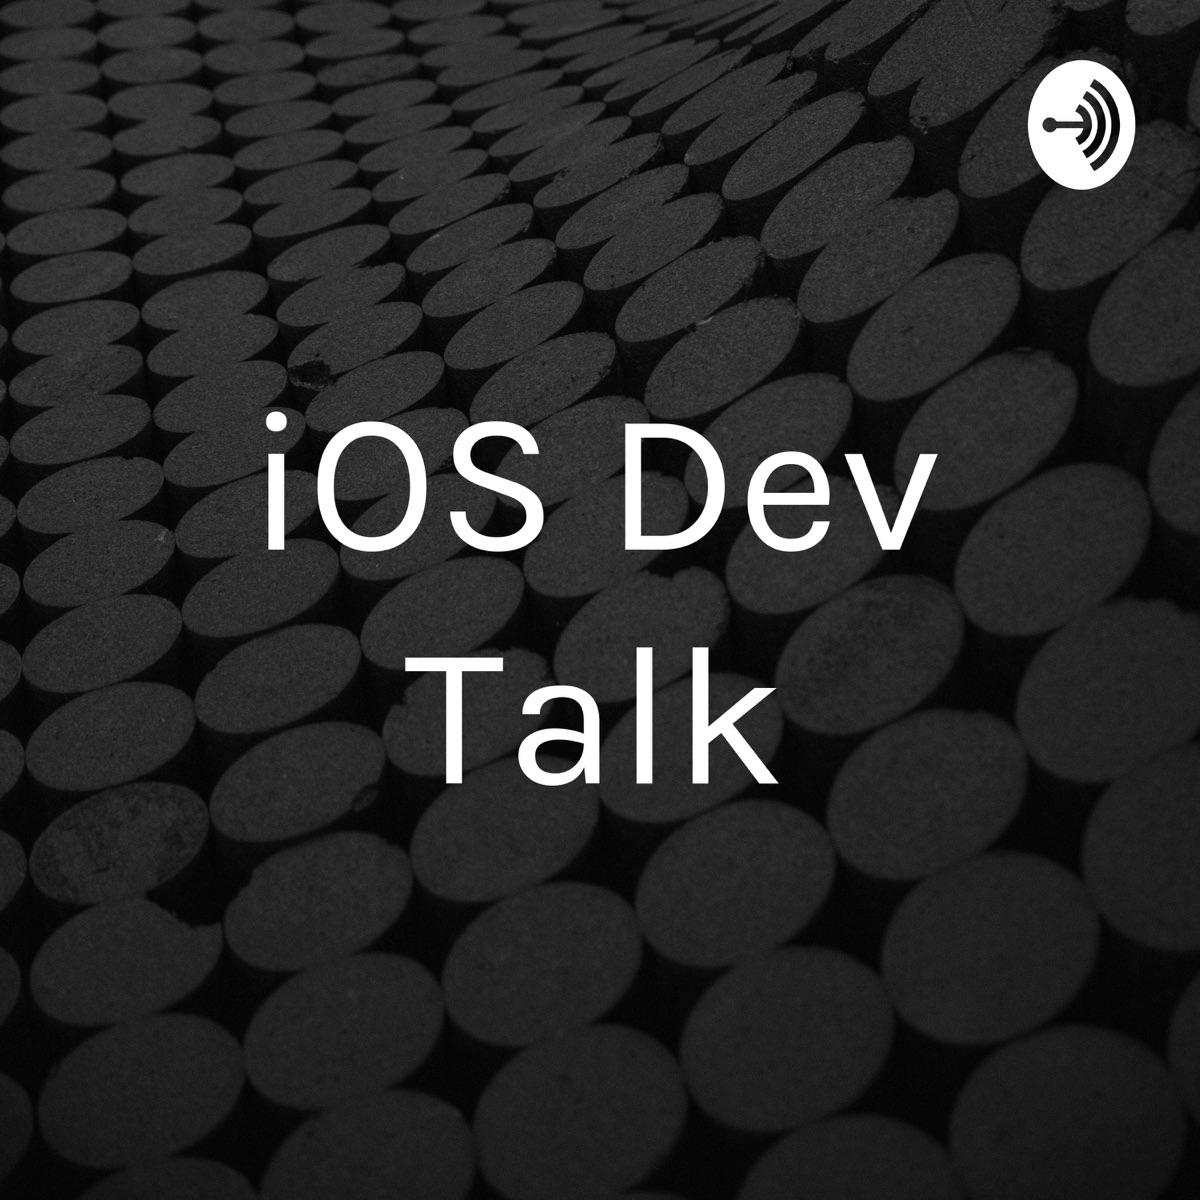 iOS Dev Talk